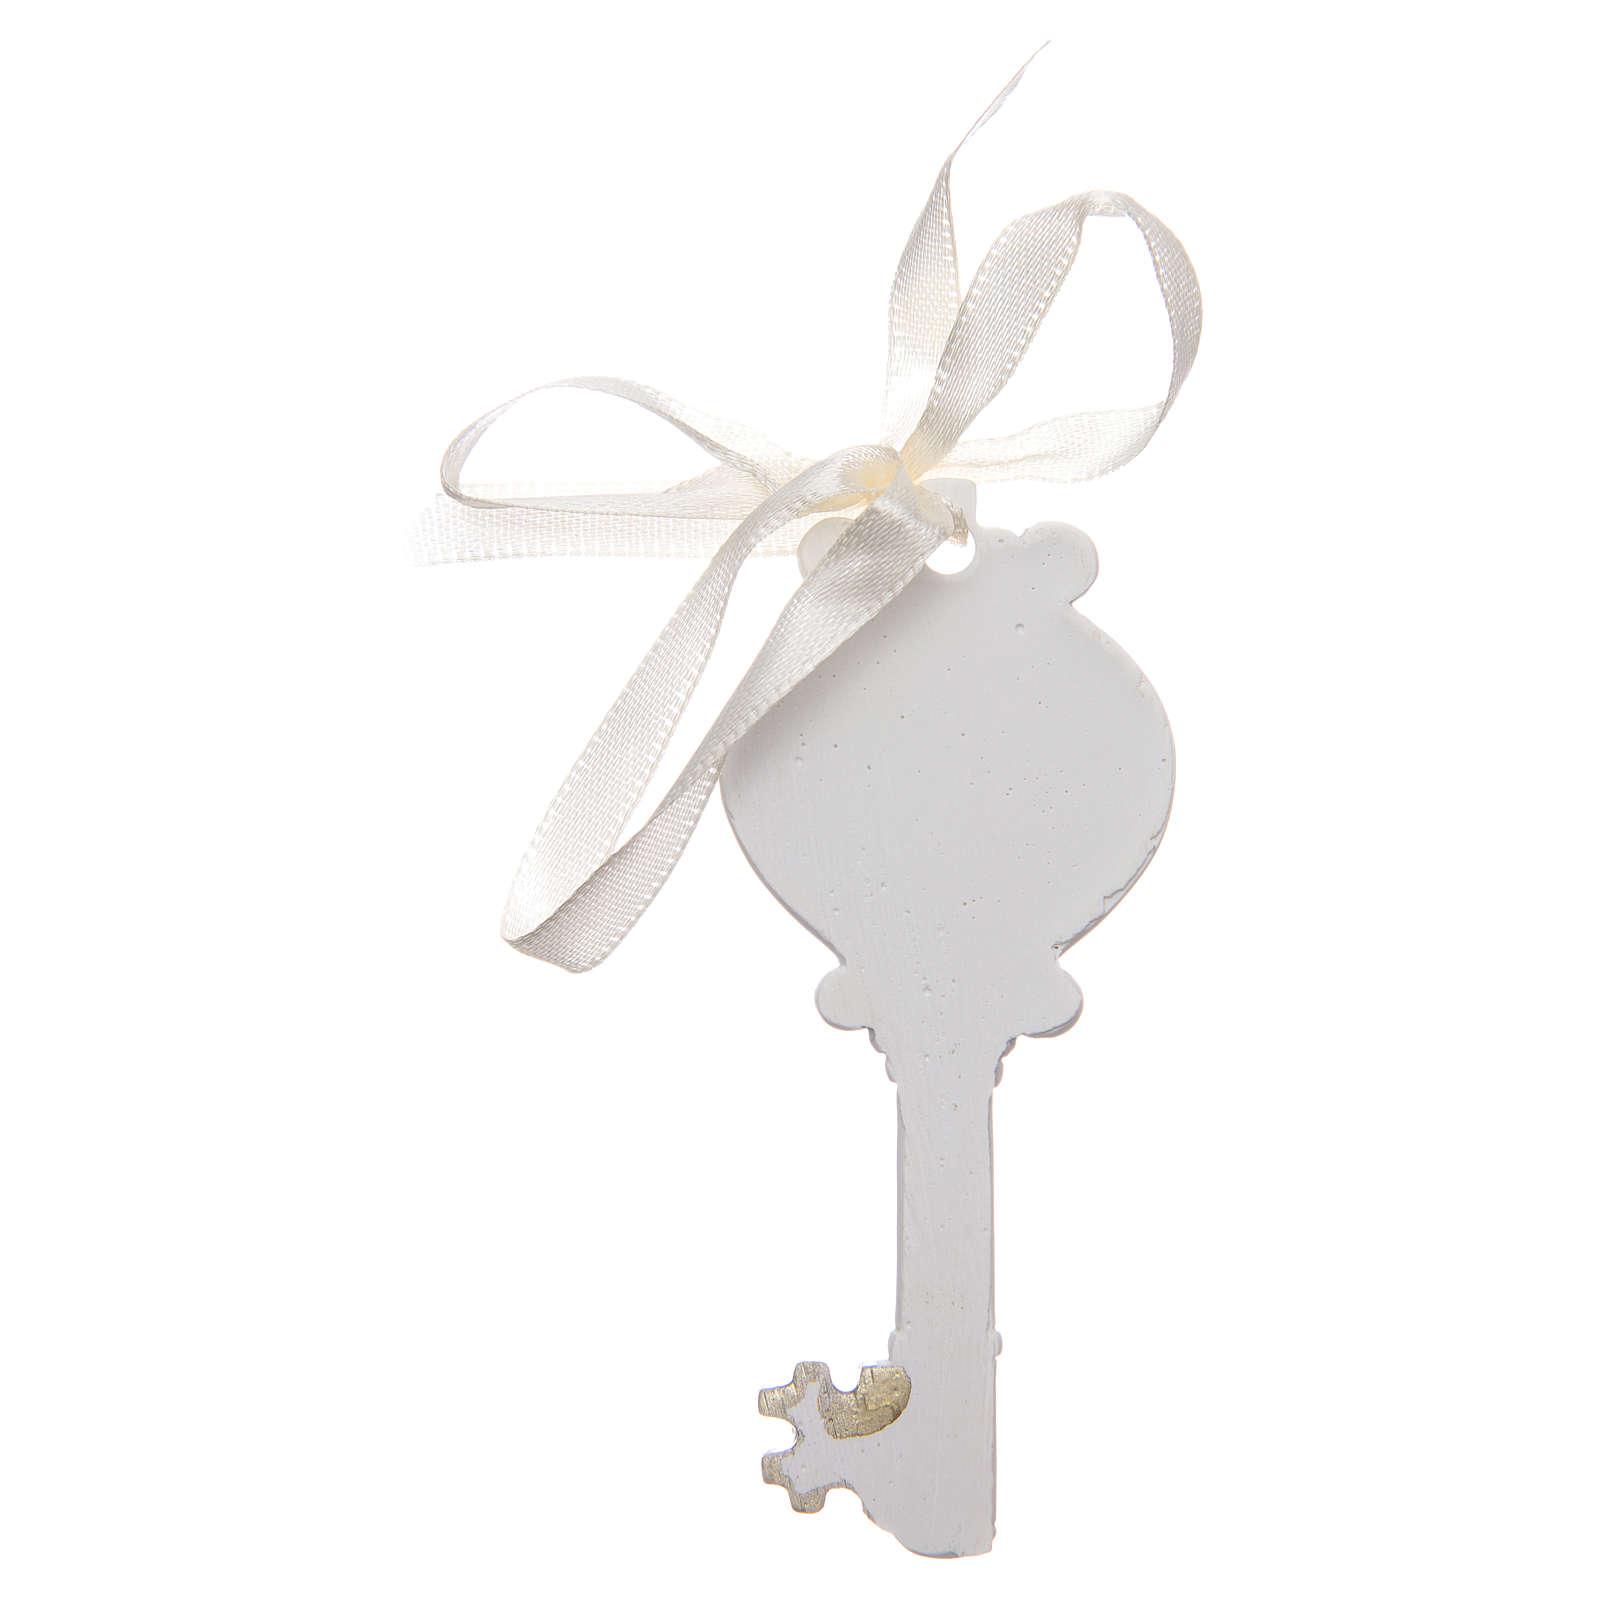 Ricordino chiave Cresima  4x9 cm 3